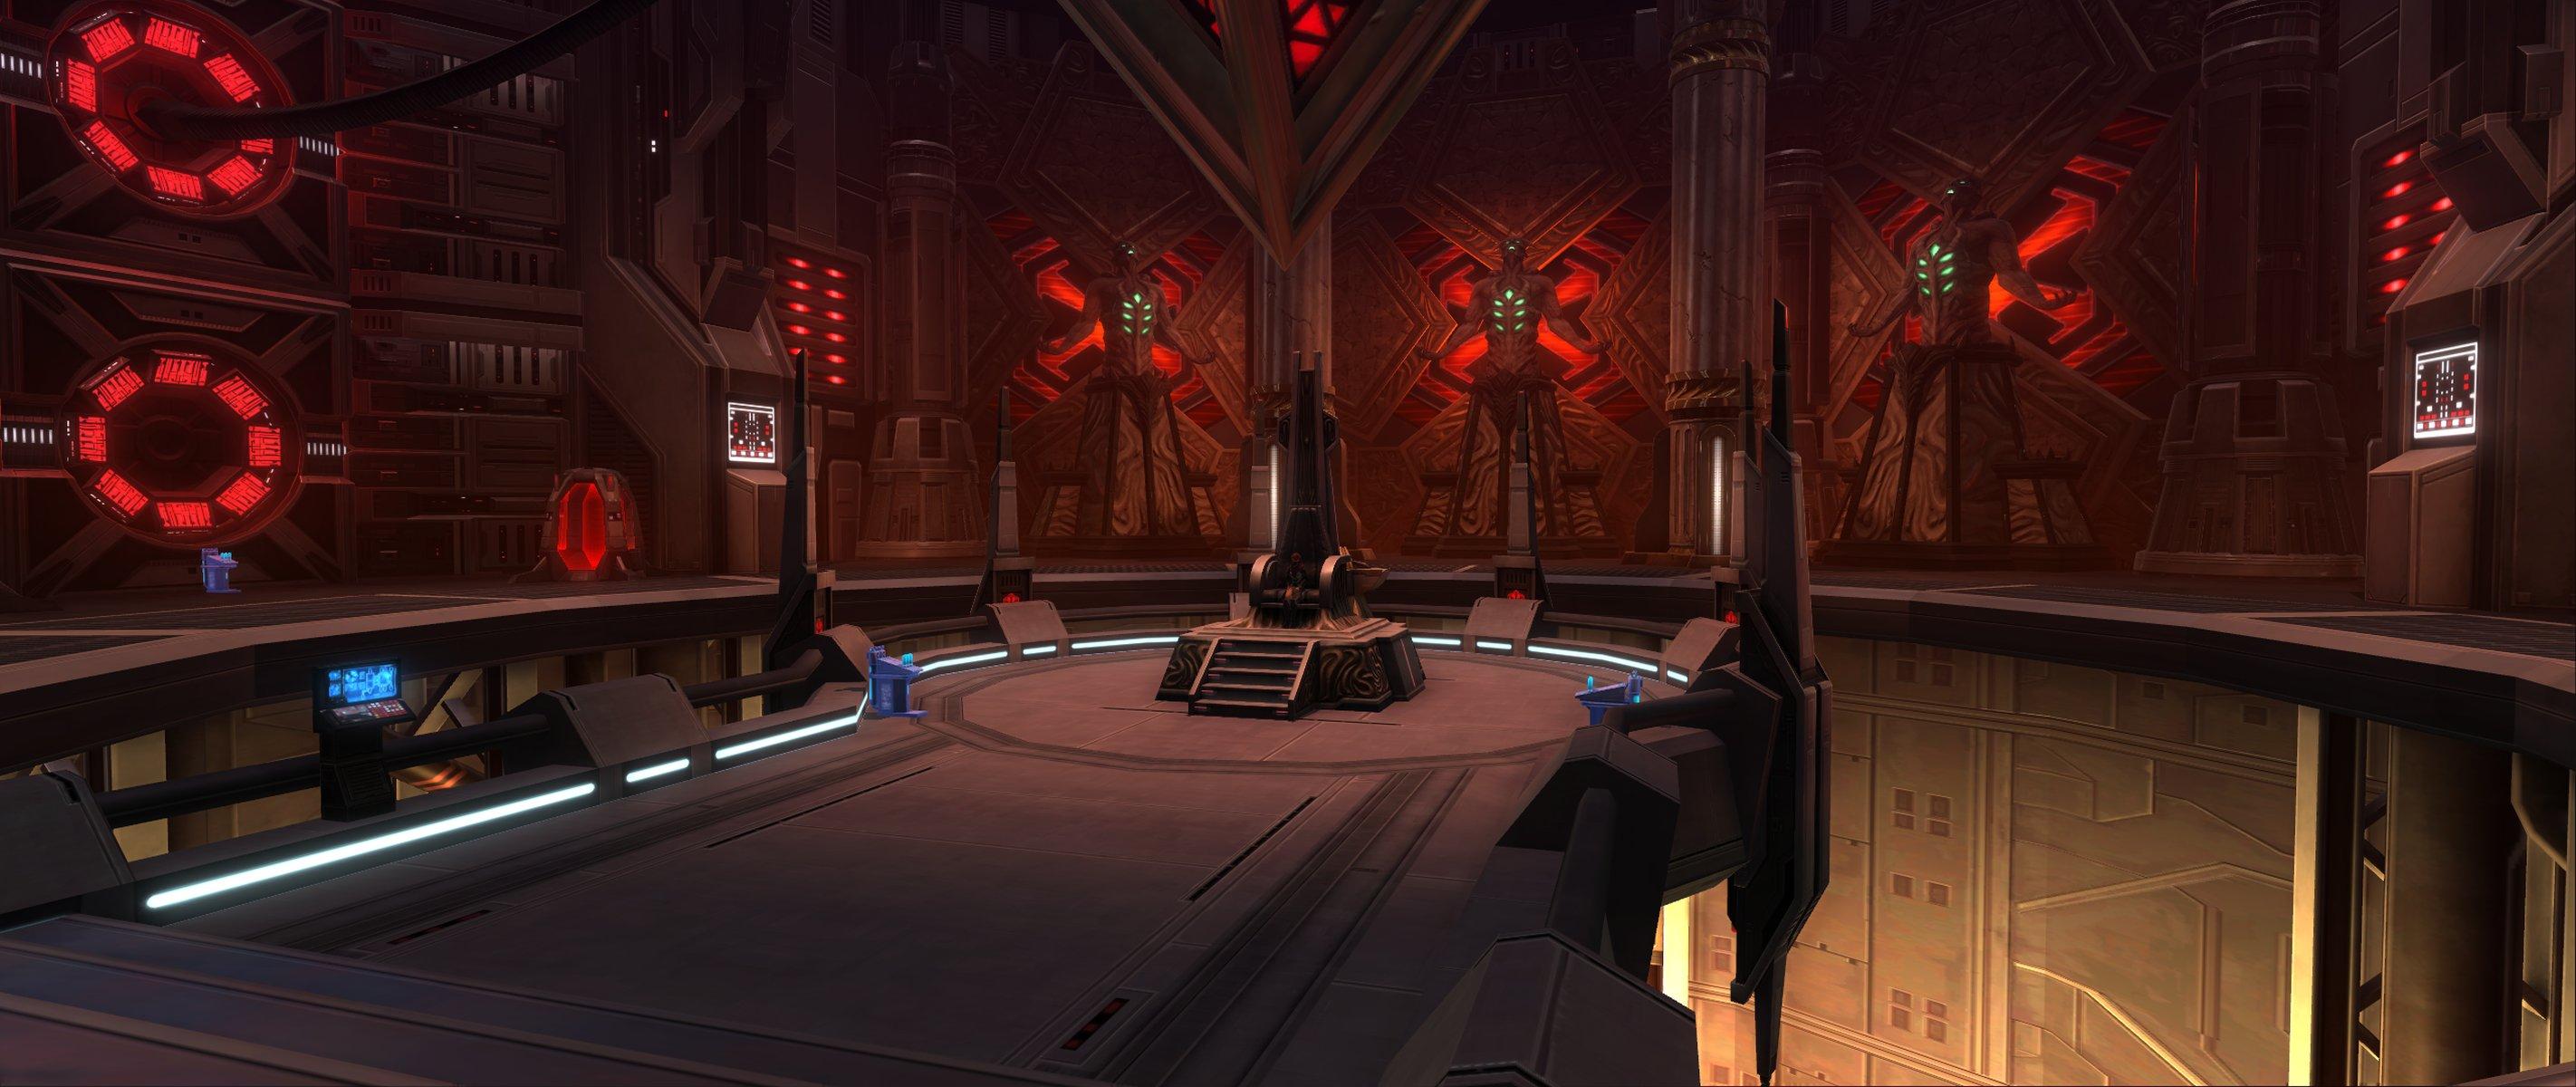 Star Wars The Old Republic Screenshot 2017.10.22 - 21.44.36.94